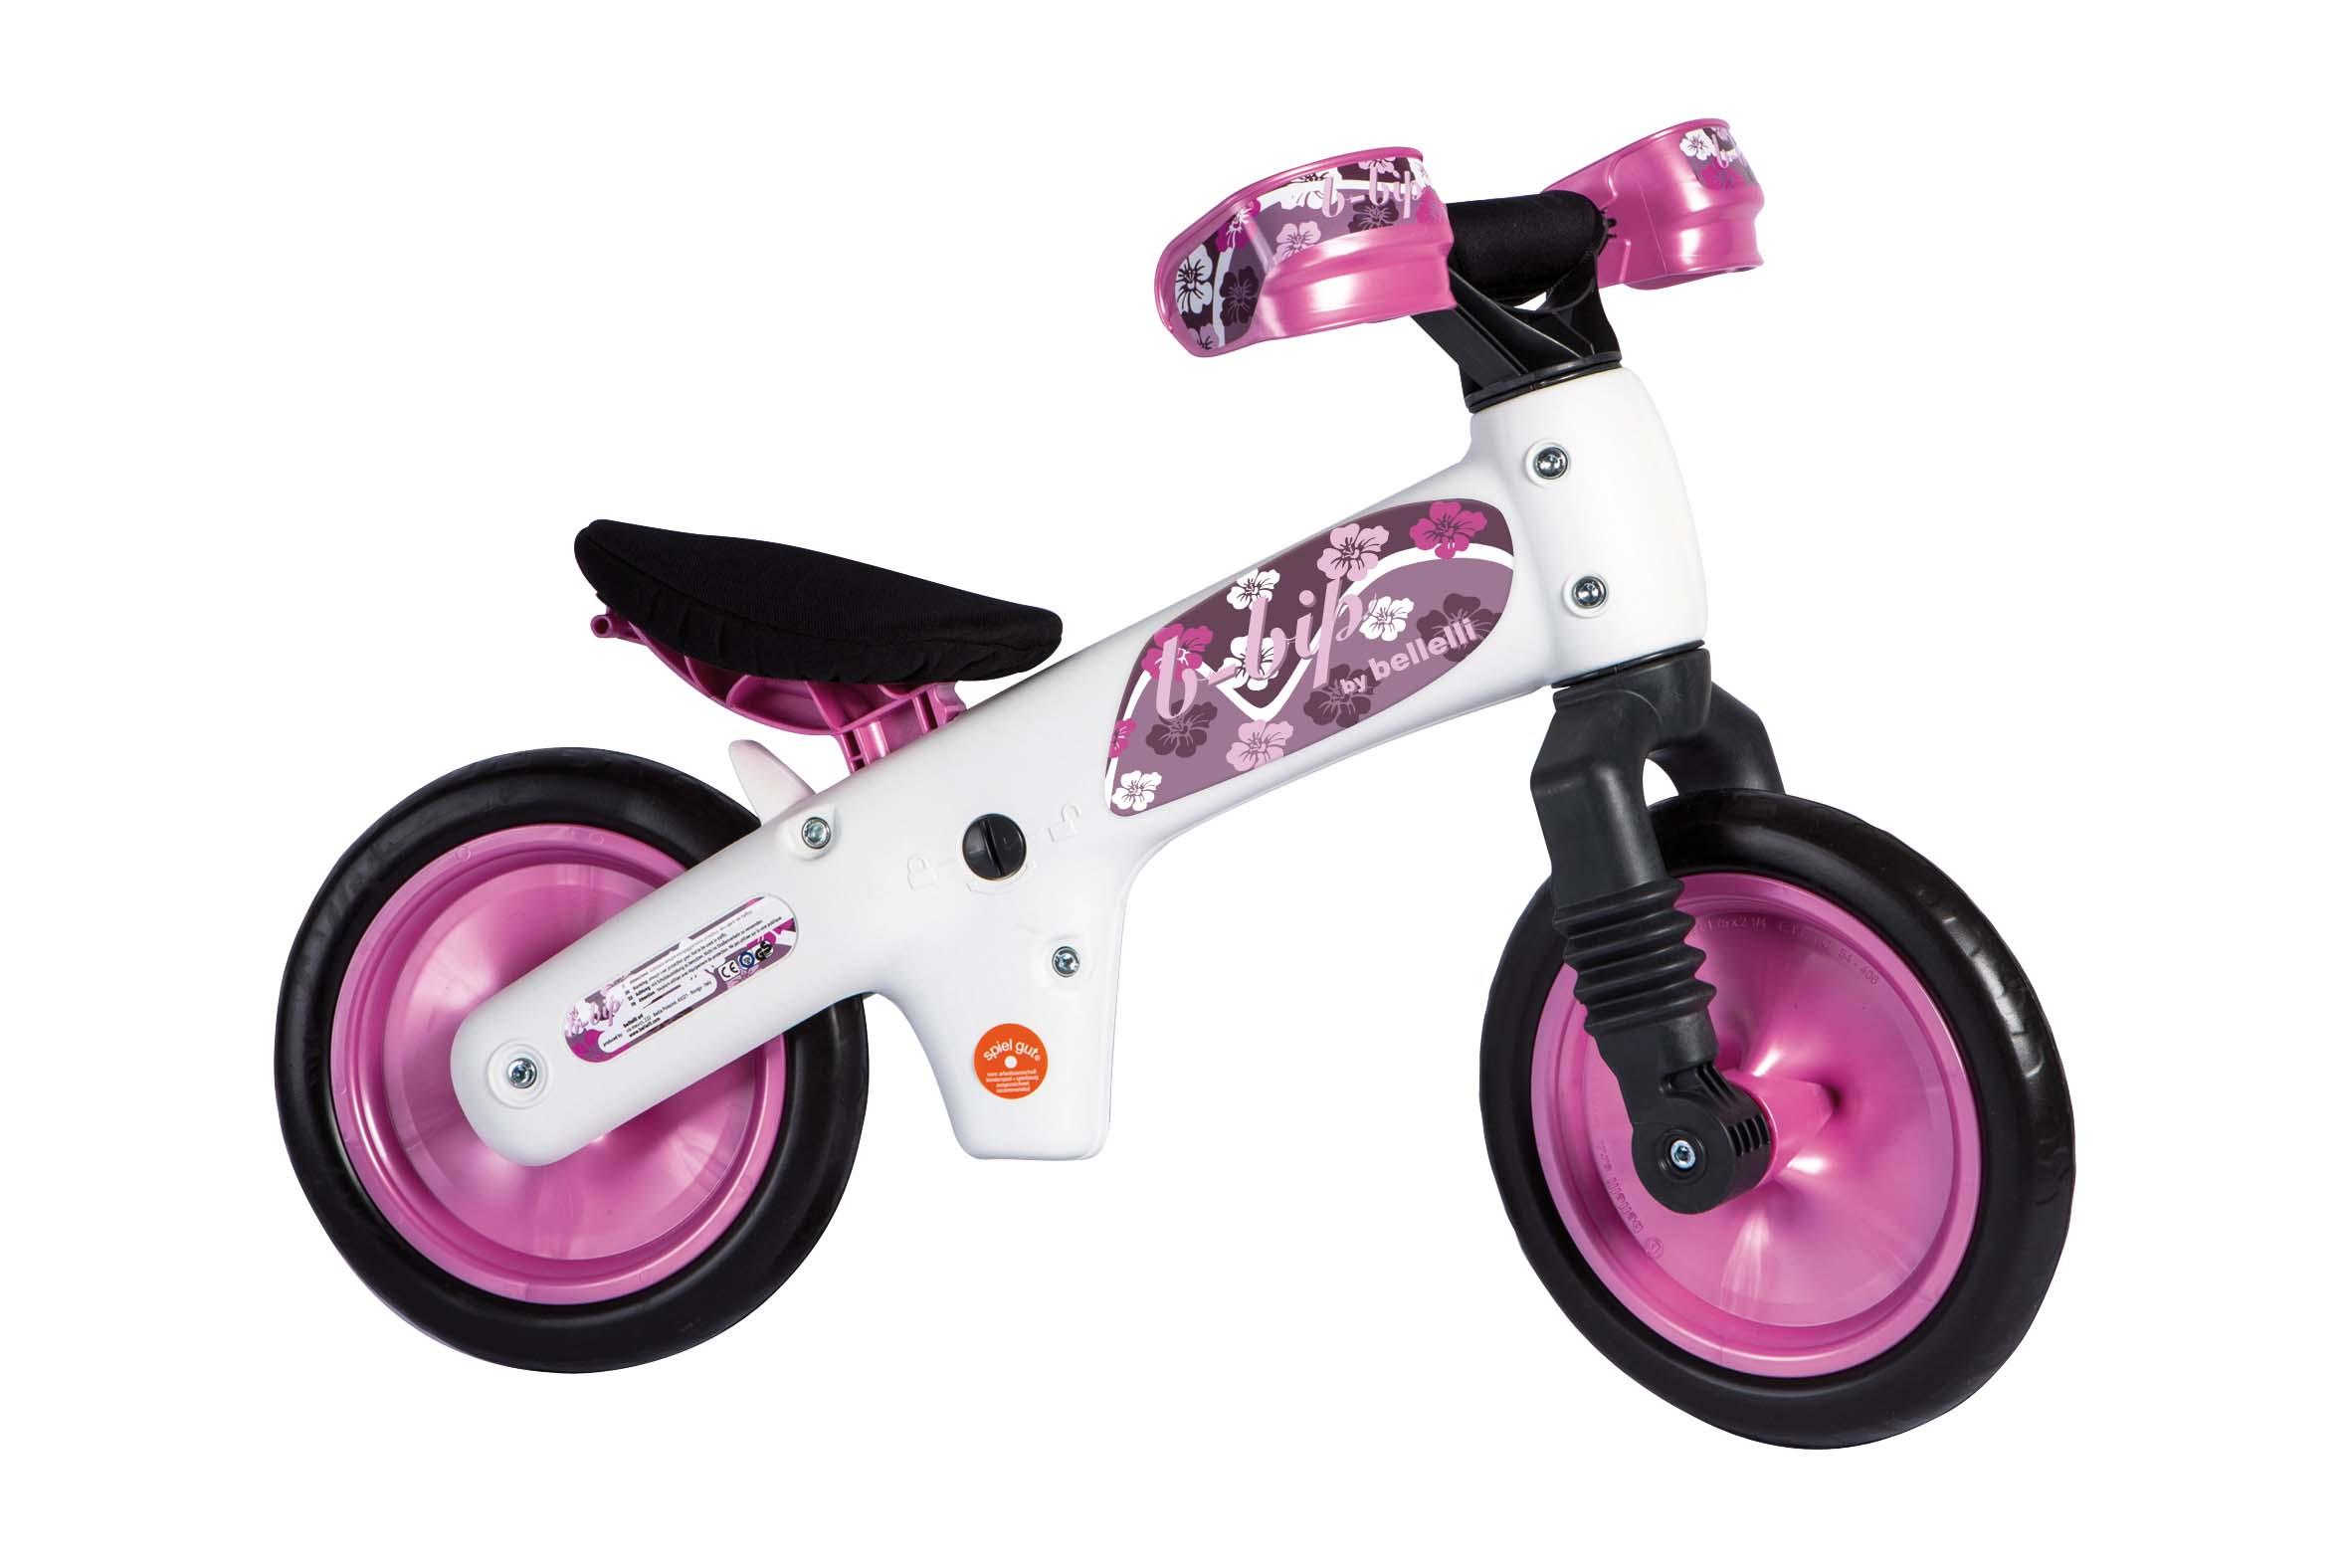 Детский беговел Bellelli b bip бело розовый